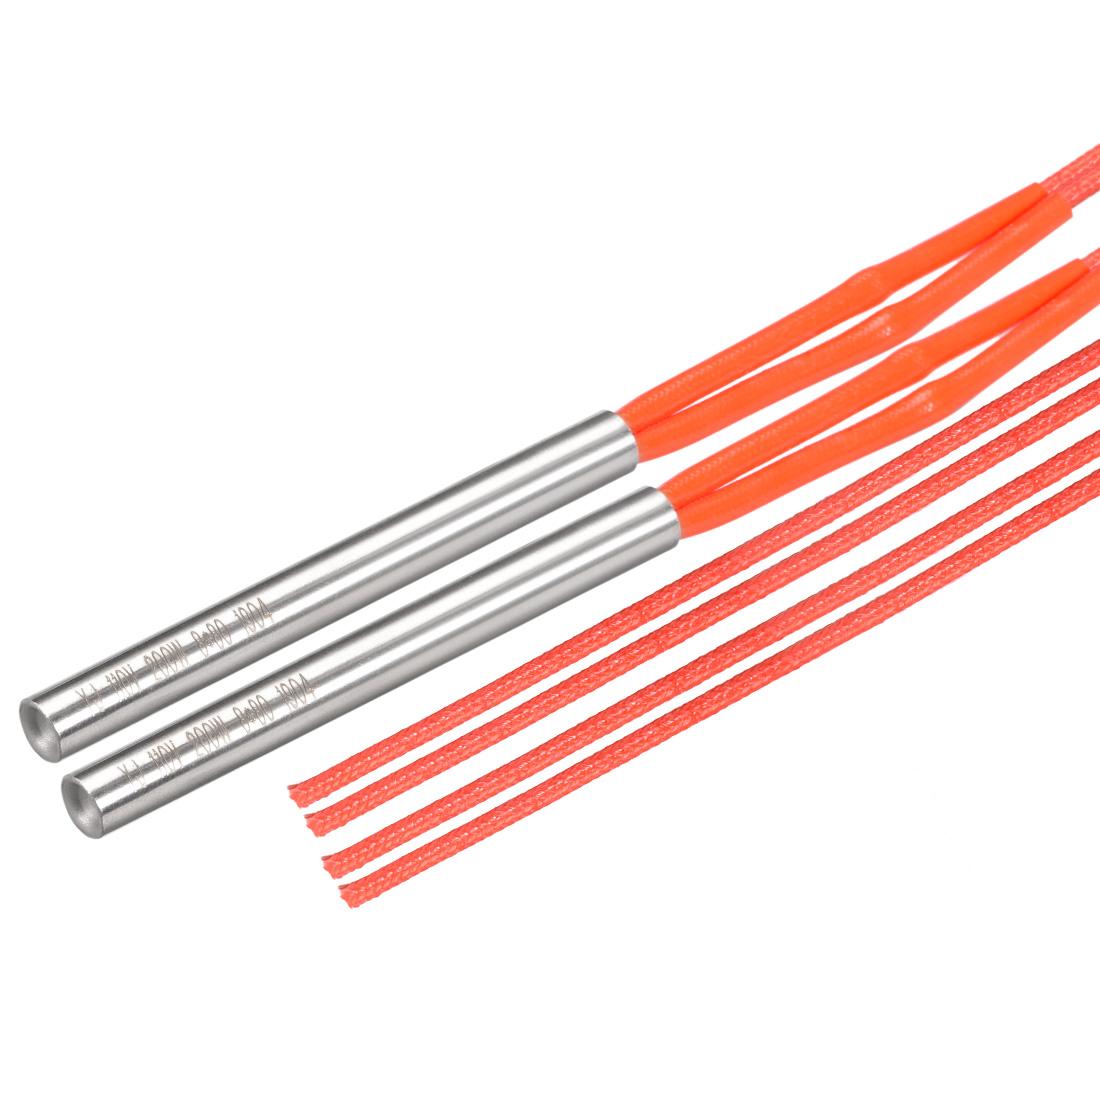 2PCS Cartridge Heater AC 110V 200 Watt Stainless Steel Heat Element Replacement